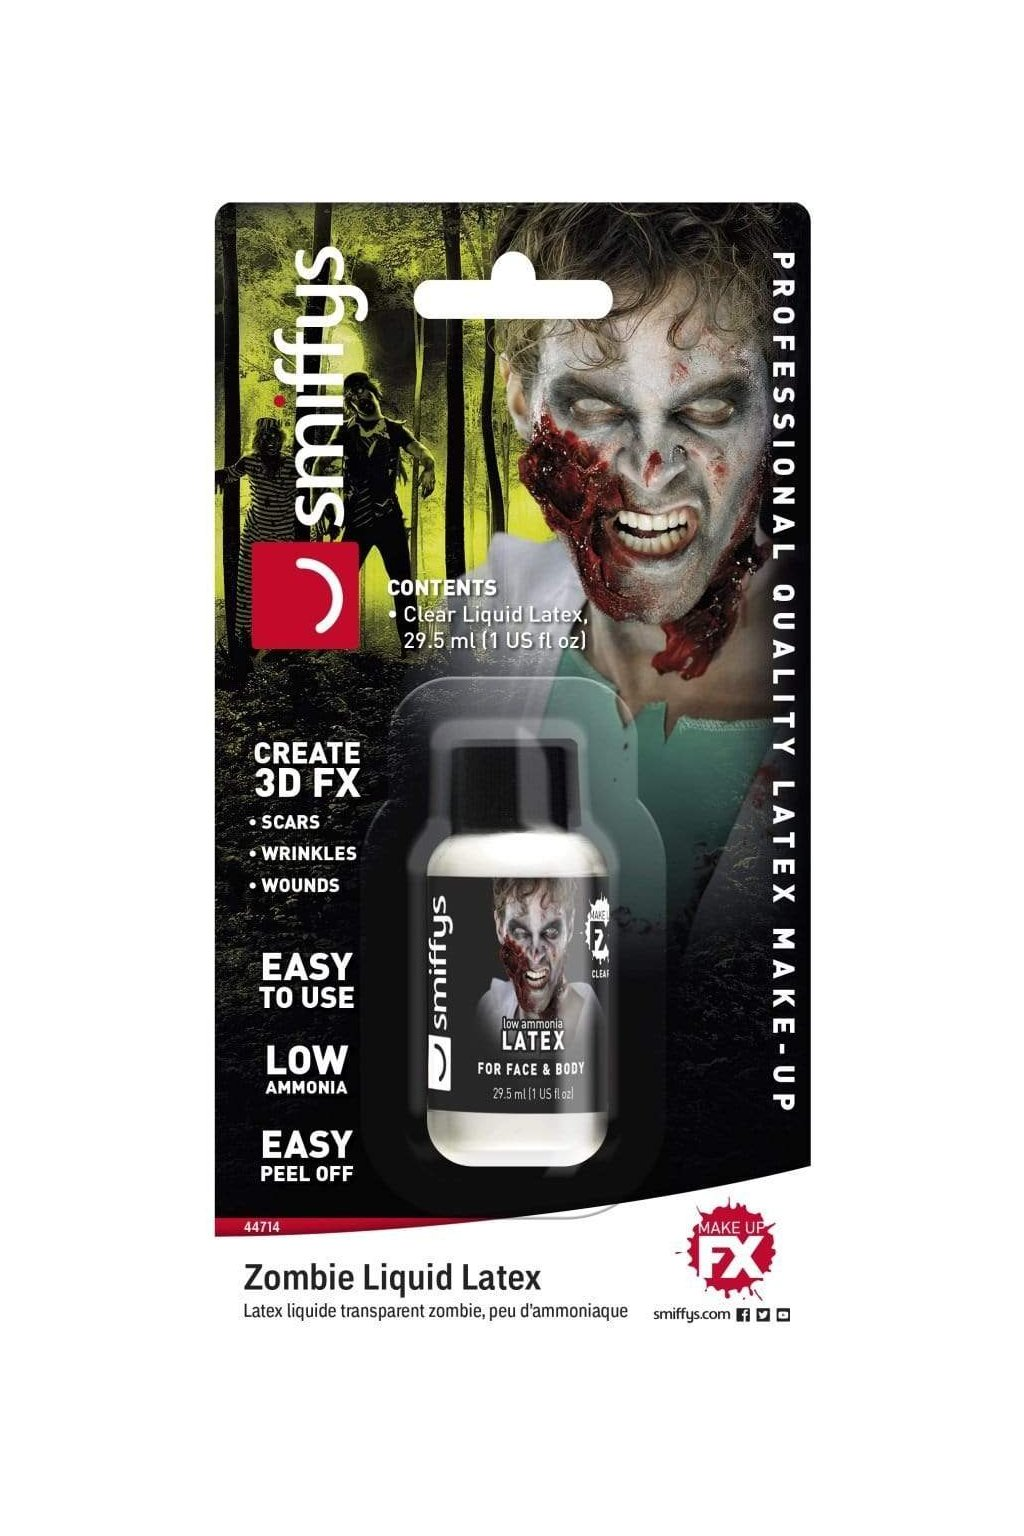 zombie liquid latex low ammonia 29 57ml 1 us fl oz alternative view8 2000x